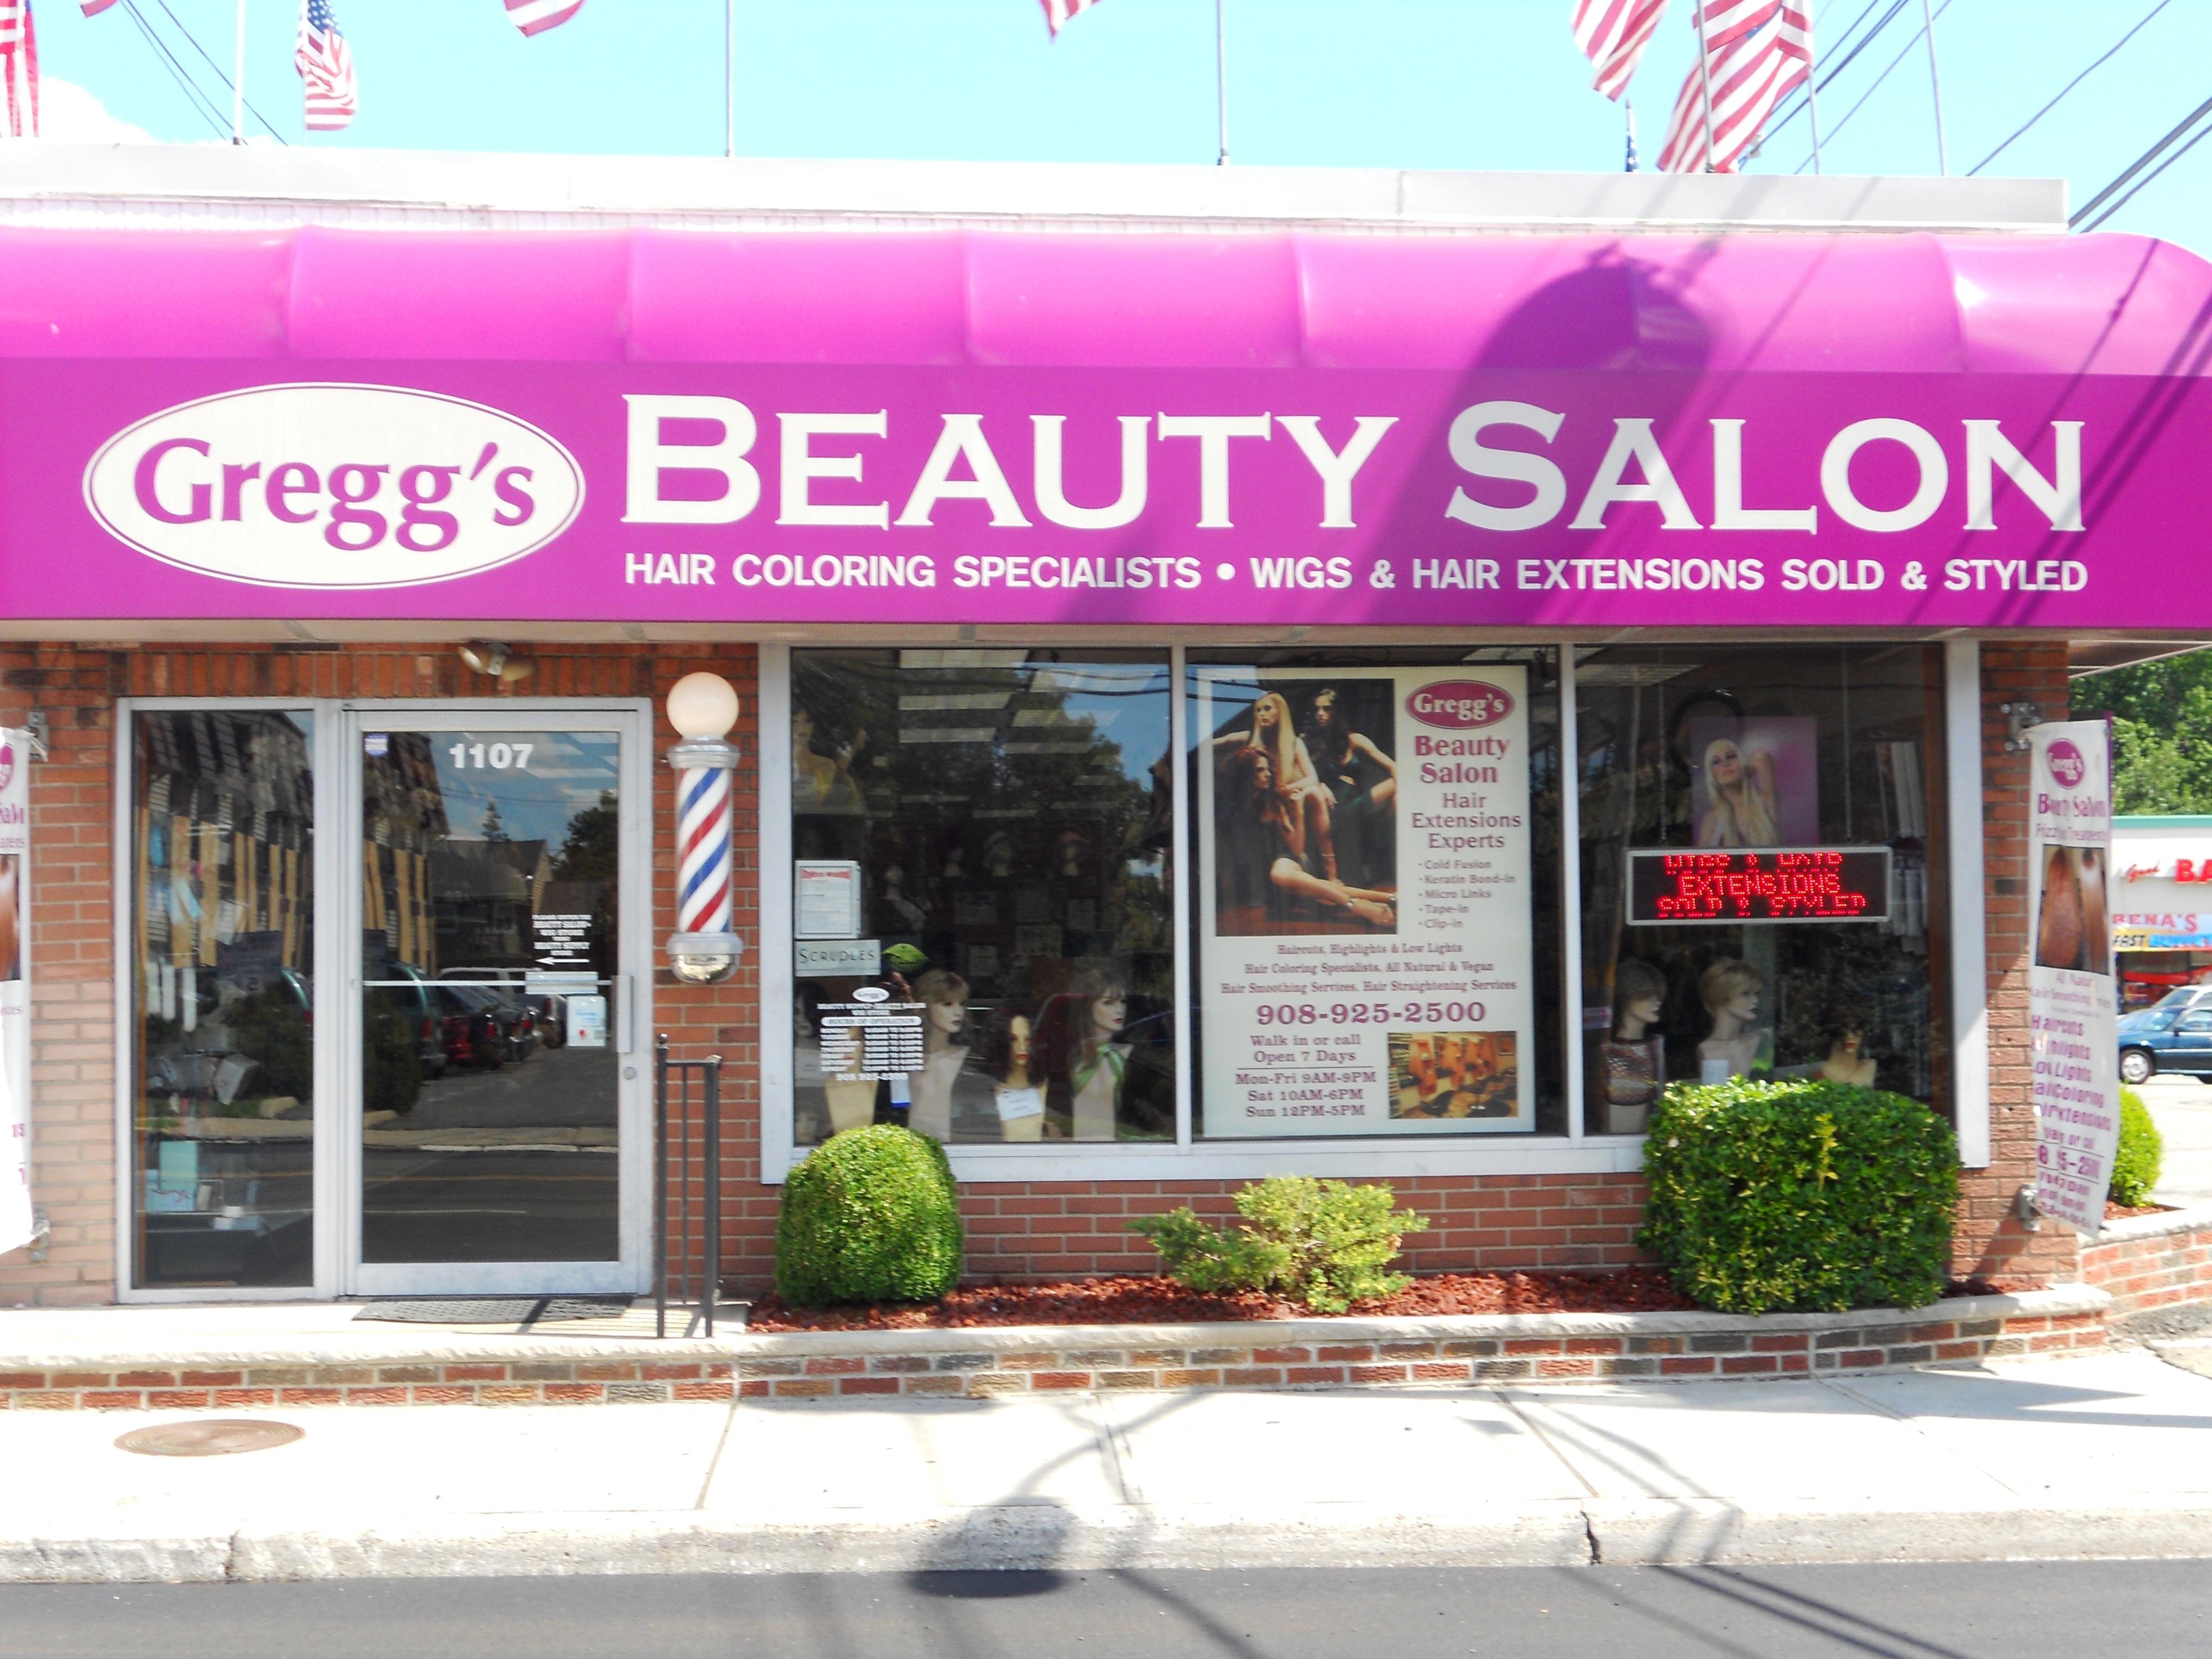 Gregg's Full Service Beauty Salon